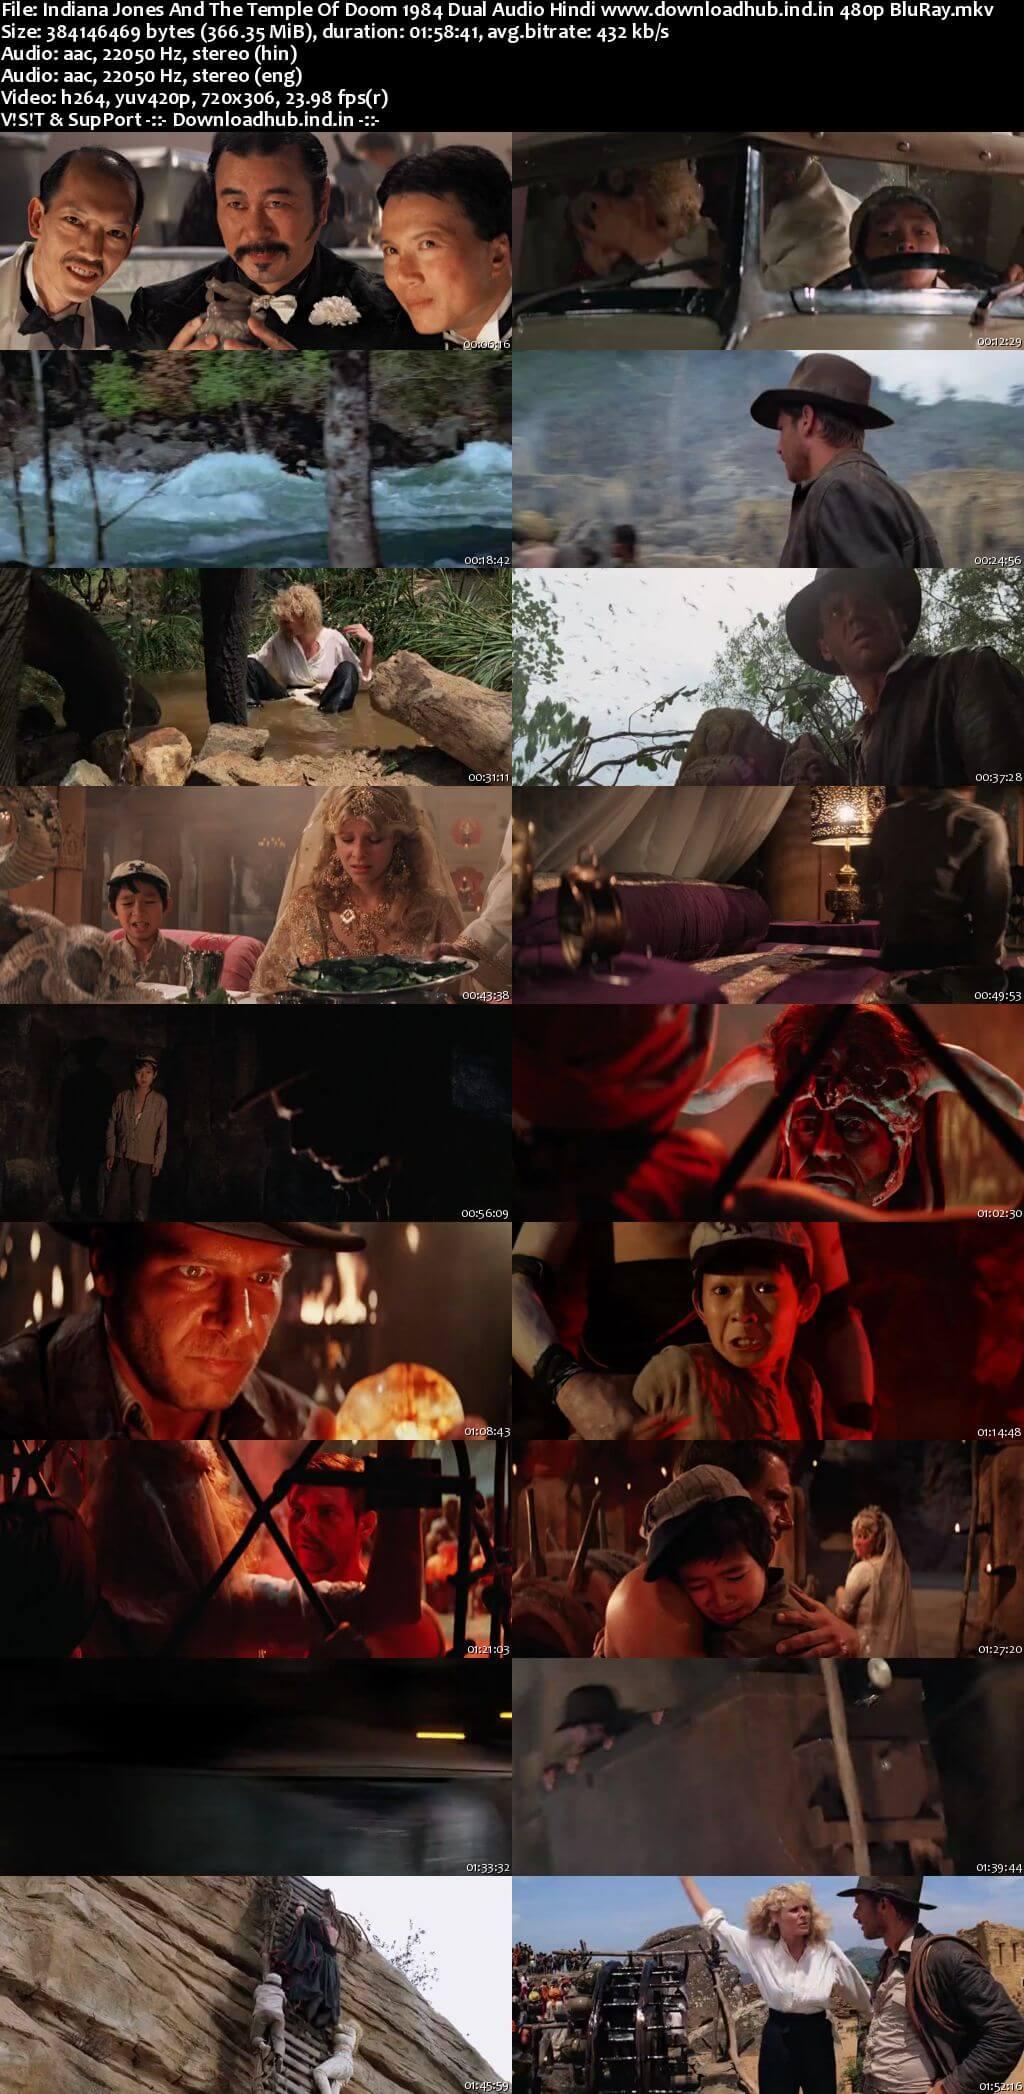 Indiana Jones and the Temple of Doom 1984 Hindi Dual Audio 350MB BluRay 480p ESubs